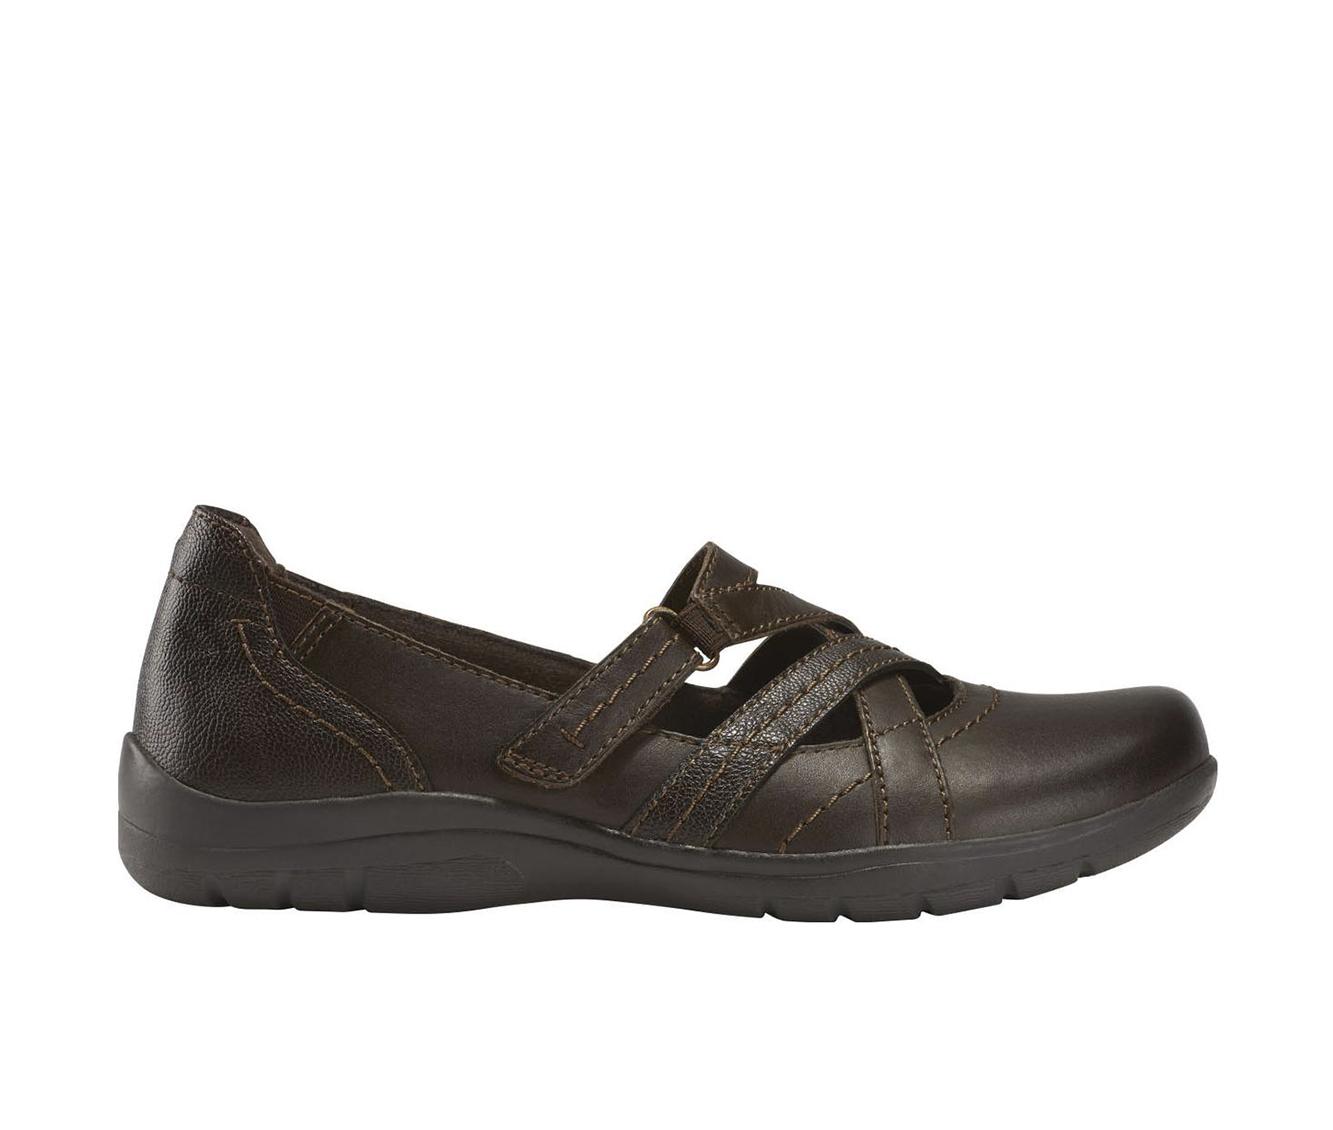 Earth Origins Rapid 2 Raelynn Women's Shoe (Brown Leather)